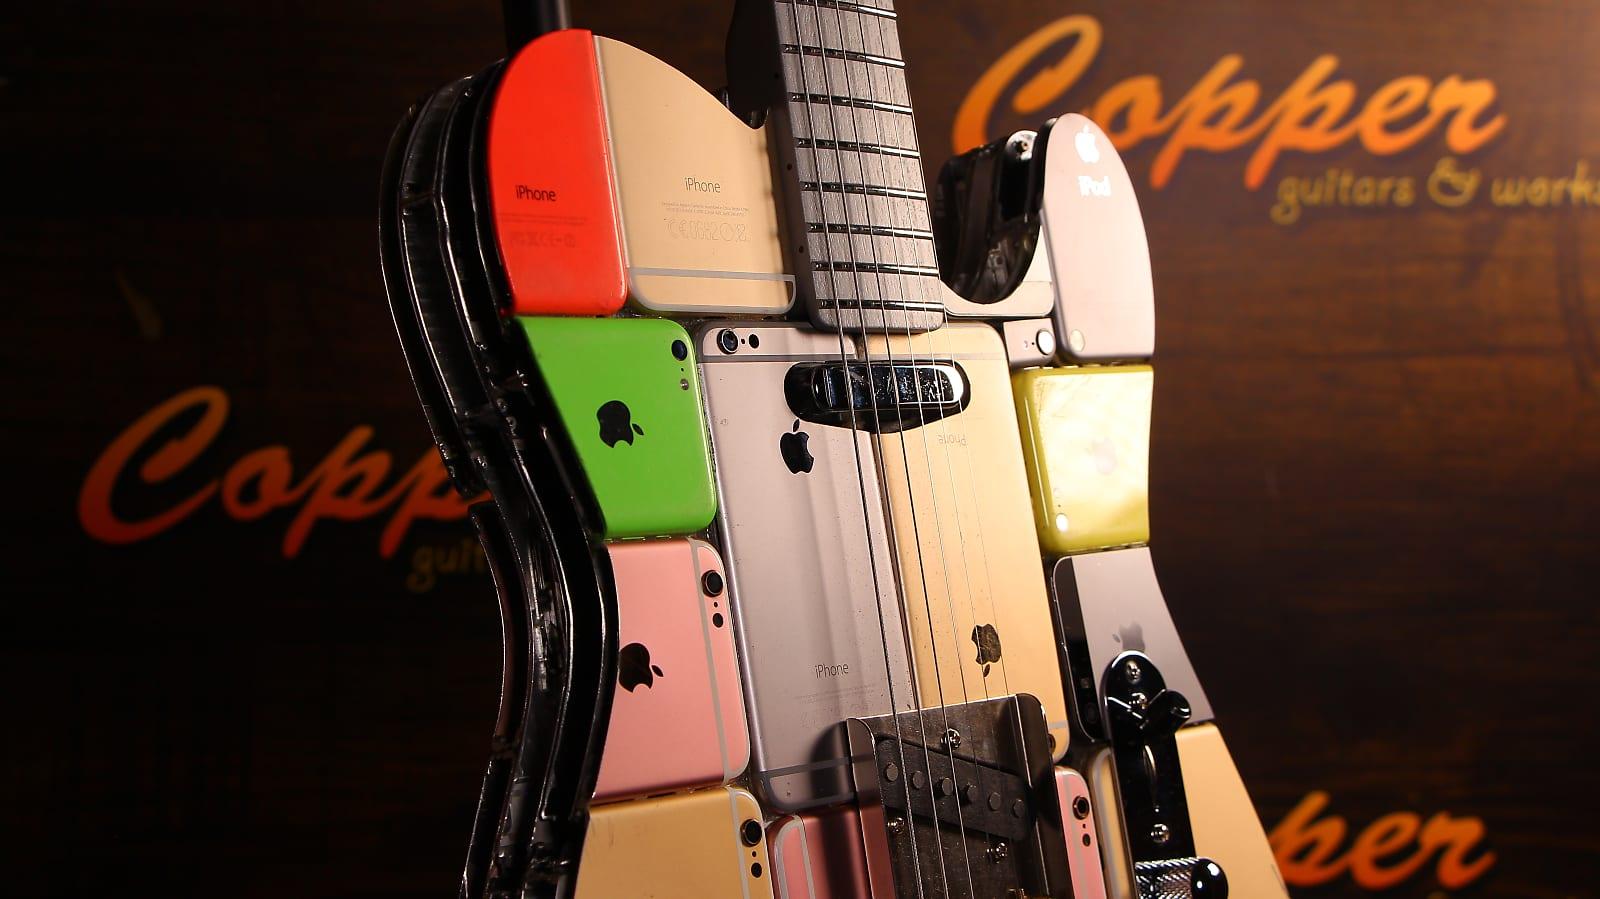 Nahaufnahme der iPhone Gitarre von Copper Guitars / Bild: Copper Guitars/Reverb, Hack4Life, Fabian Geissler, Gitarre bestehend aus iPhones